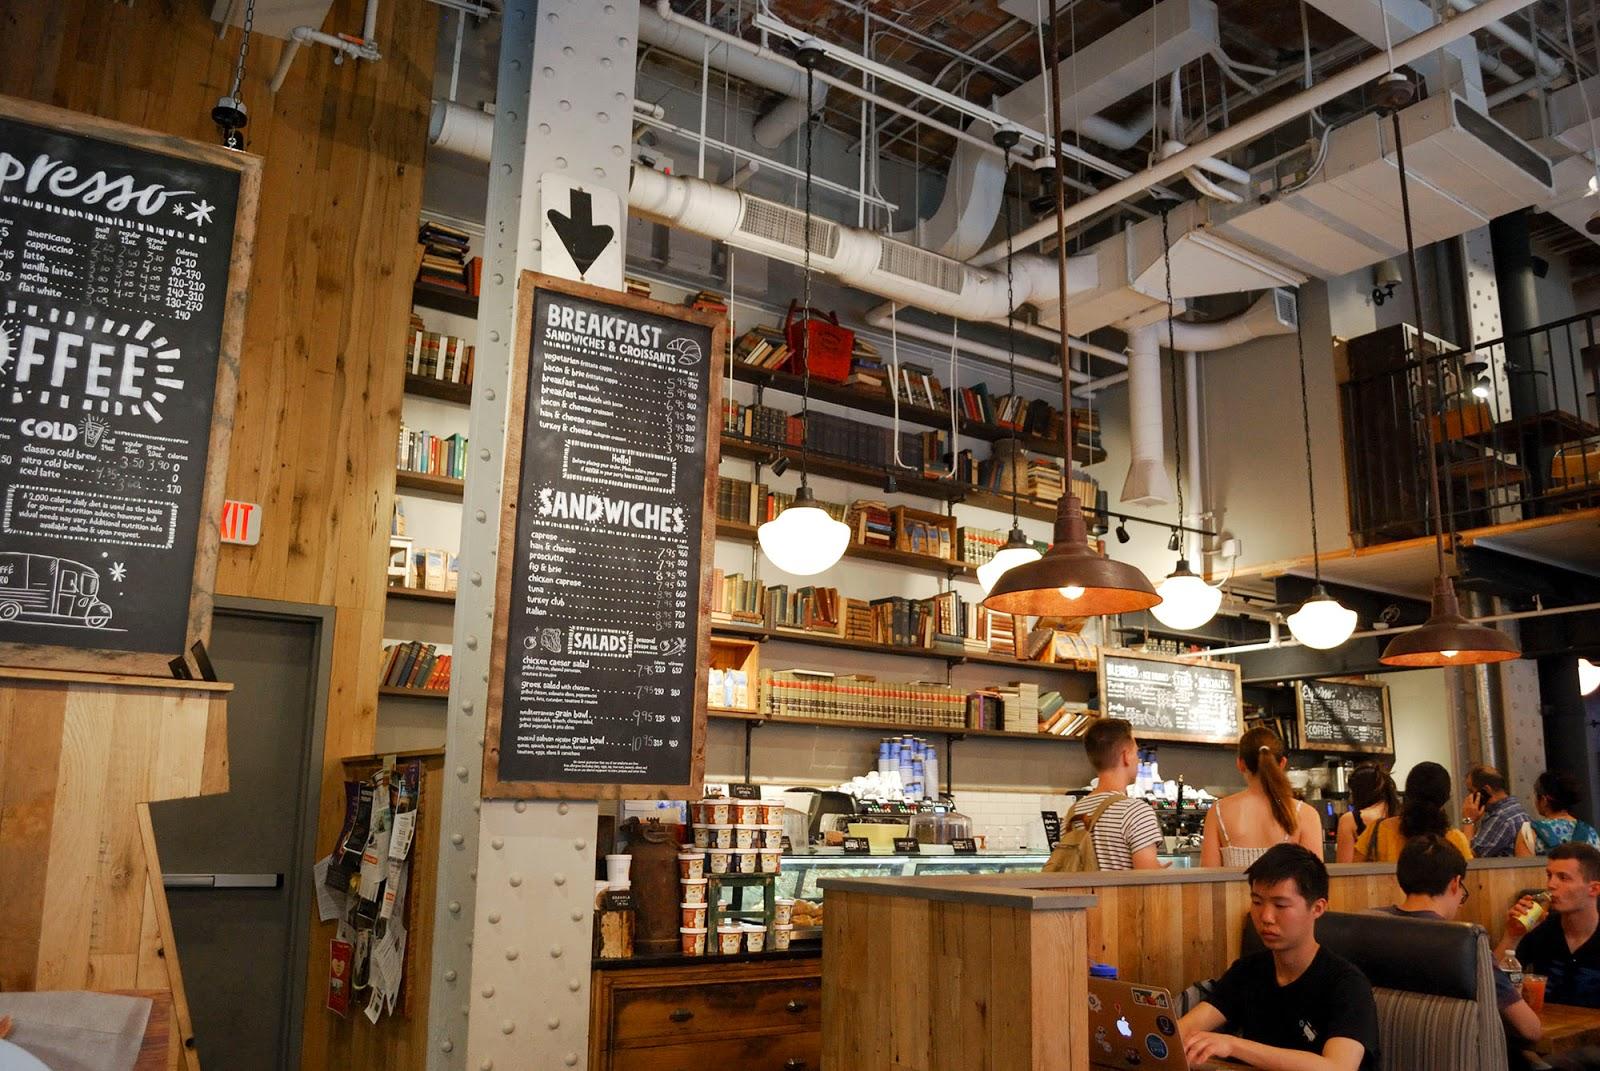 cafe nero restaurant boston usa breakfast brunch